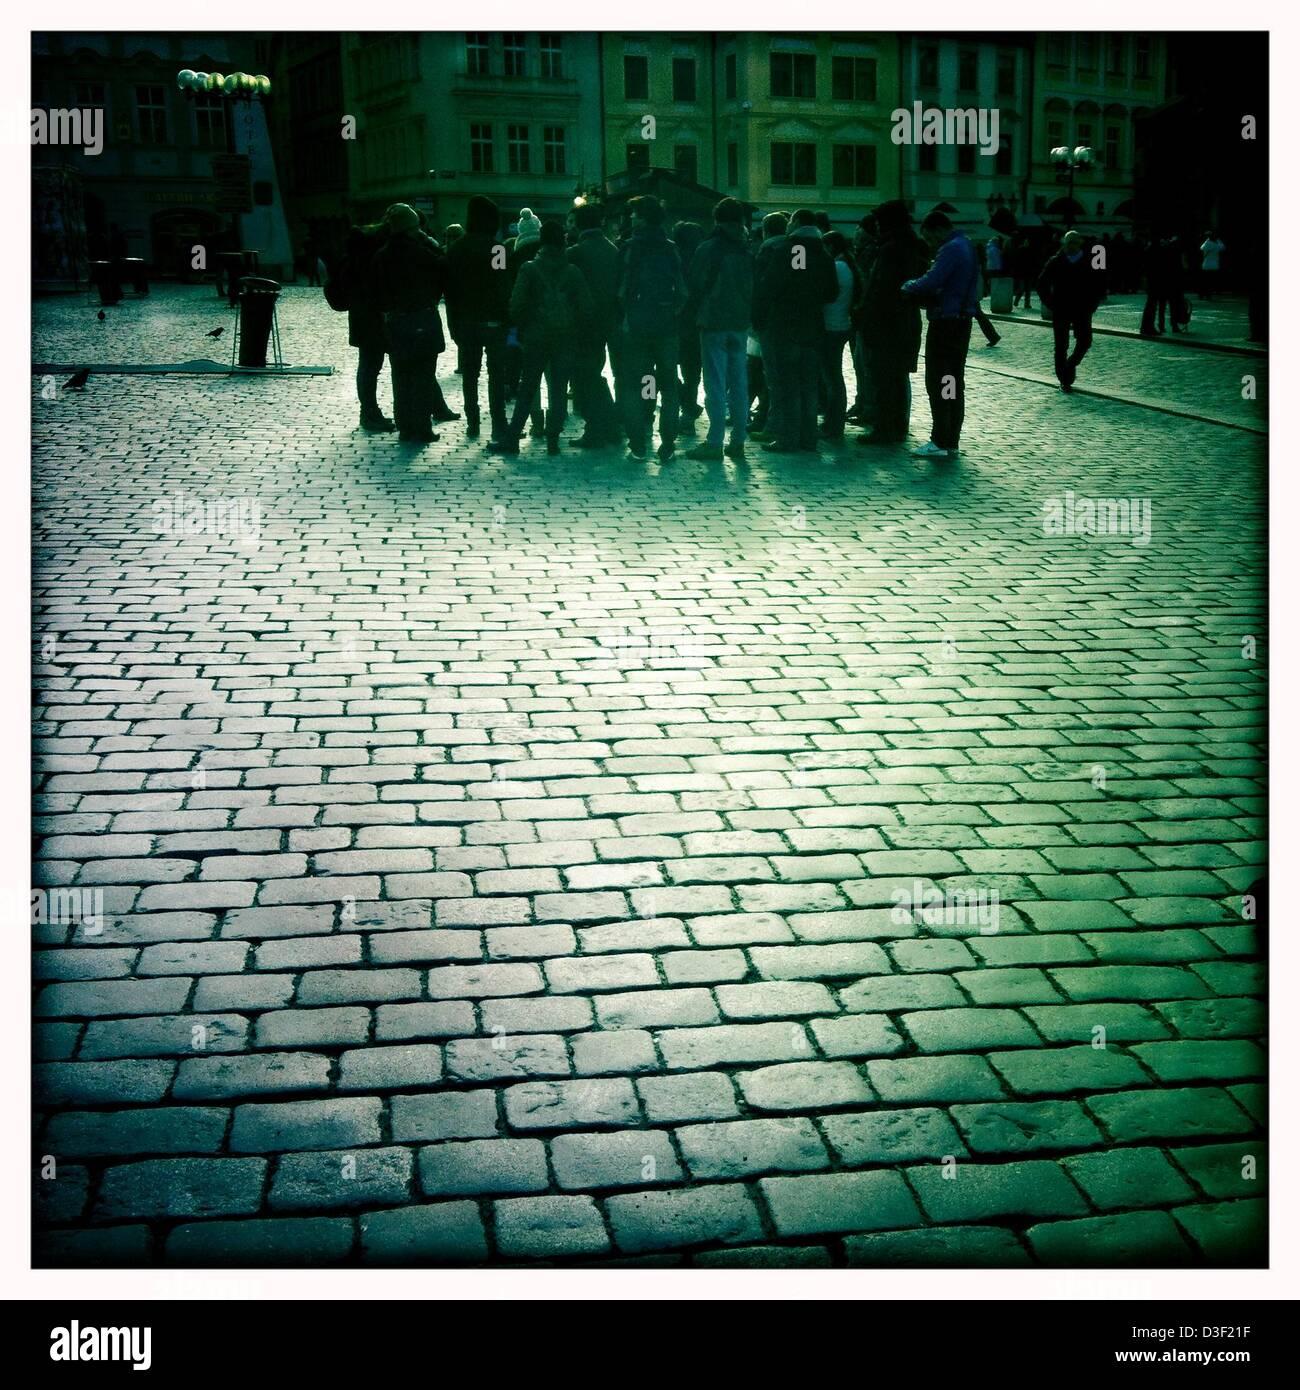 Feb. 7, 2013 - Prague, Czech Republic - Tourist on the Old Square, Prague.Prague, the capital of the Czech Republic, - Stock Image